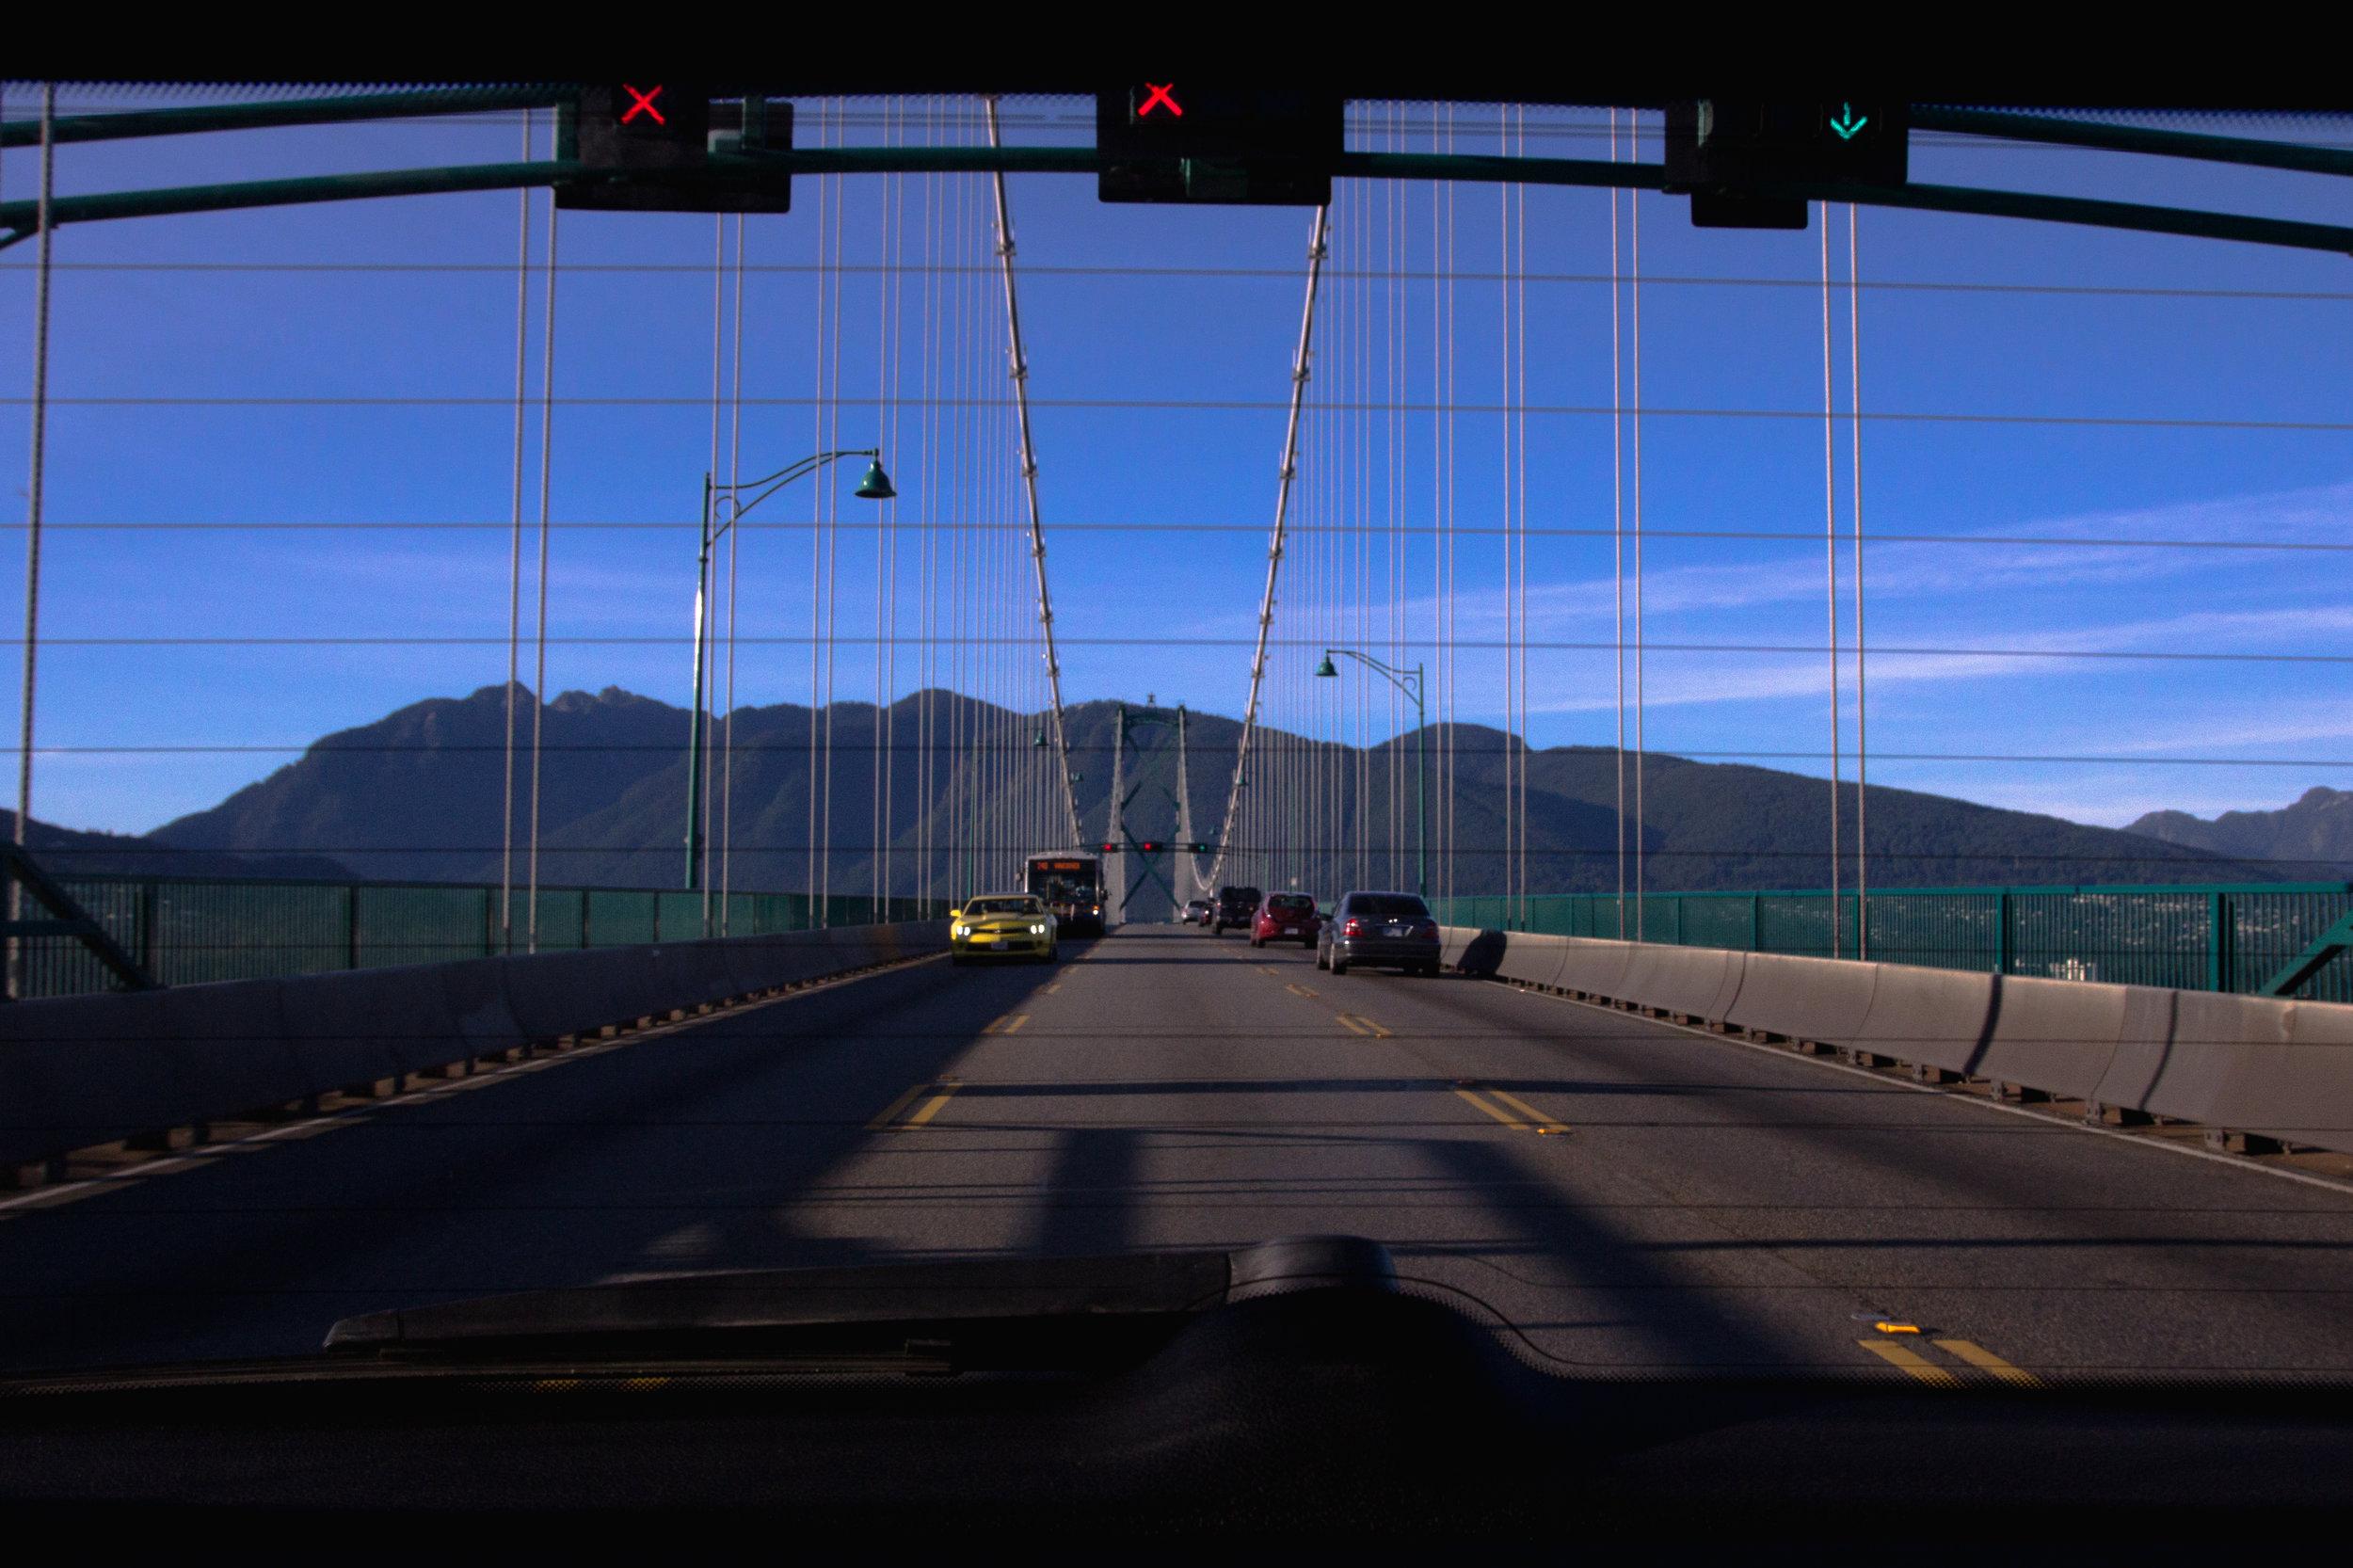 Lions Gate Bridge - Vancouver, British Columbia